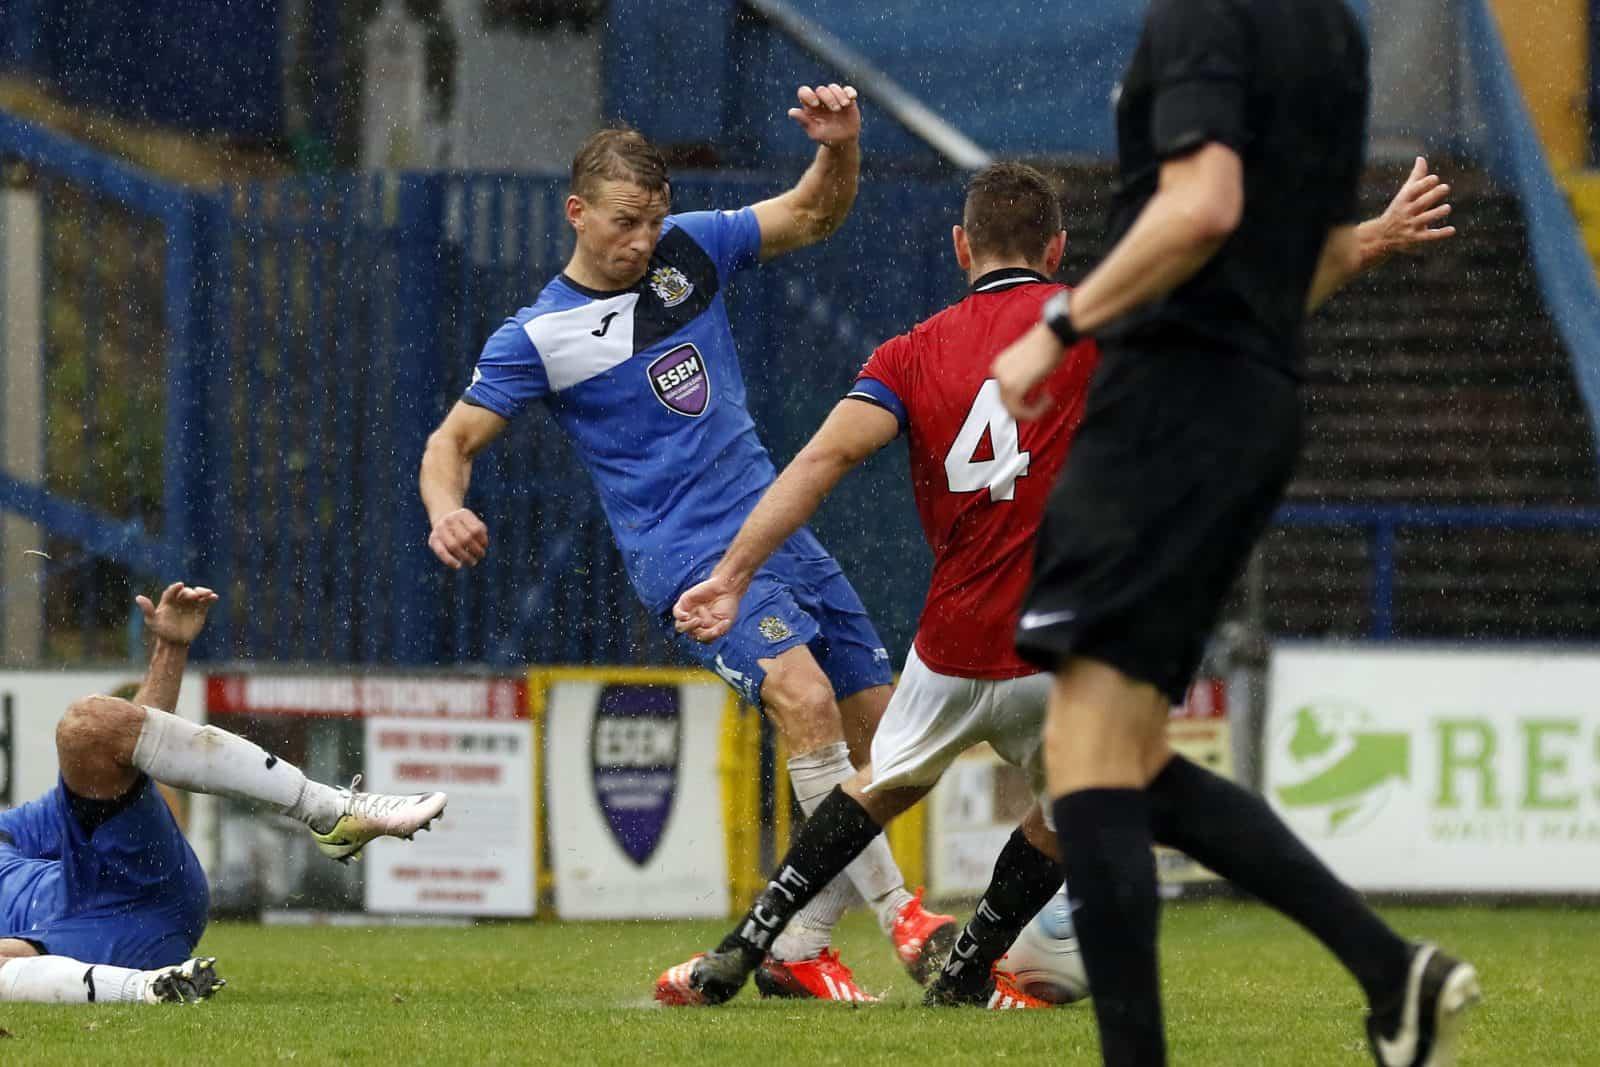 Gary Stopforth, Stockport County 3-3 FC United 30.9.17